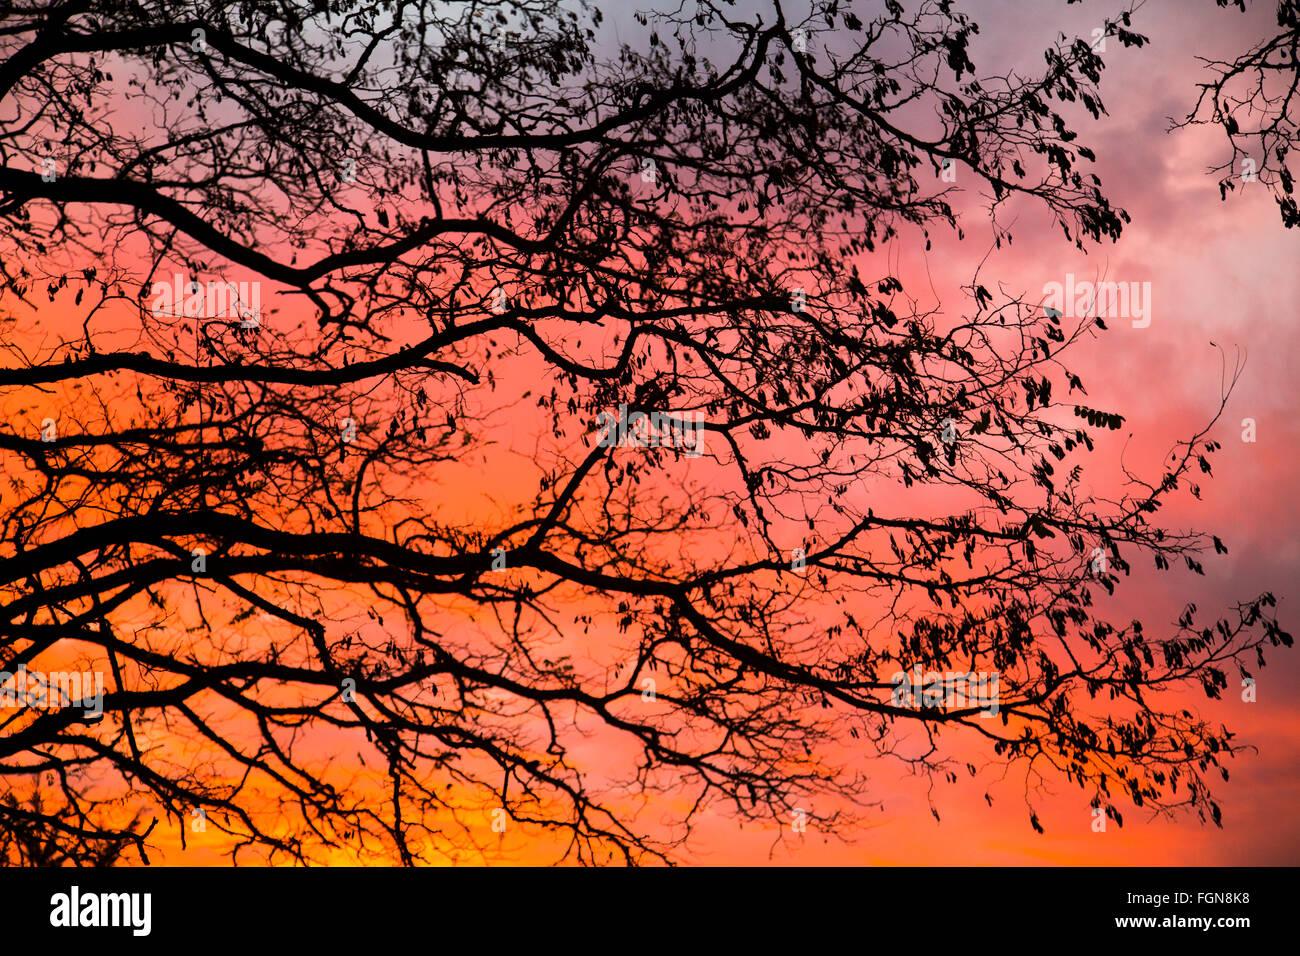 Akazie Baum Sonnenuntergang roten Himmel warm Stockbild